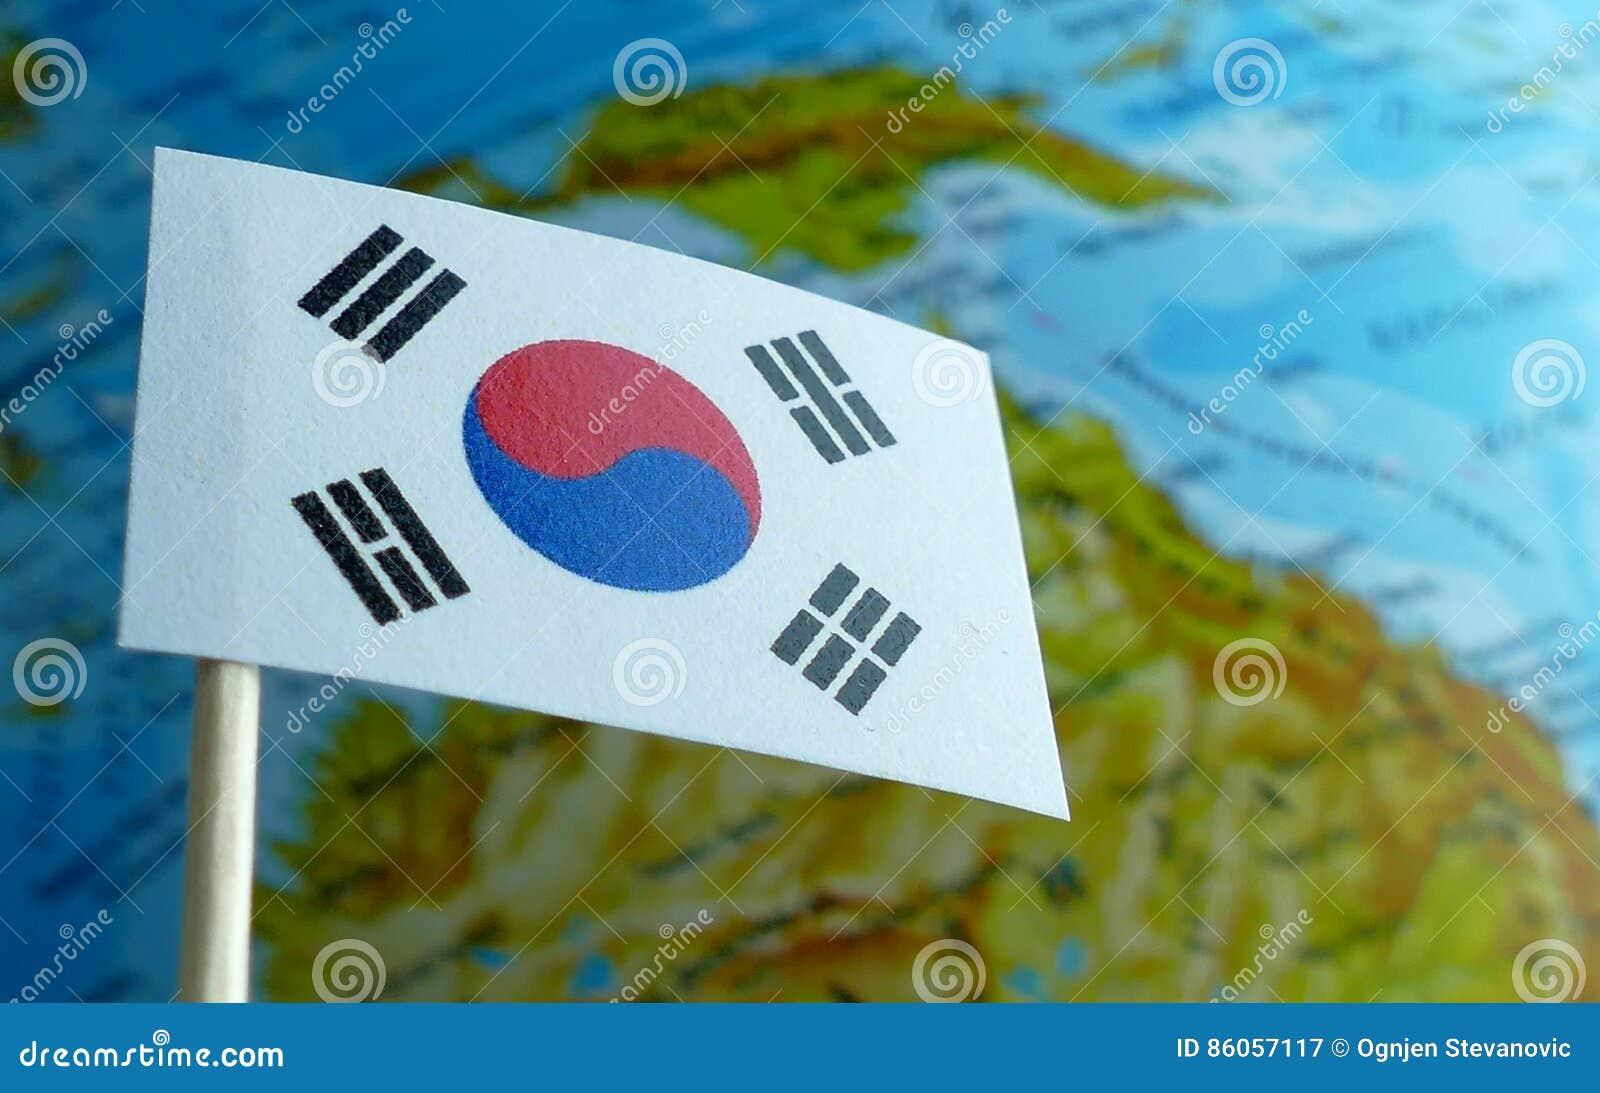 South Korea flag with a globe map as a background